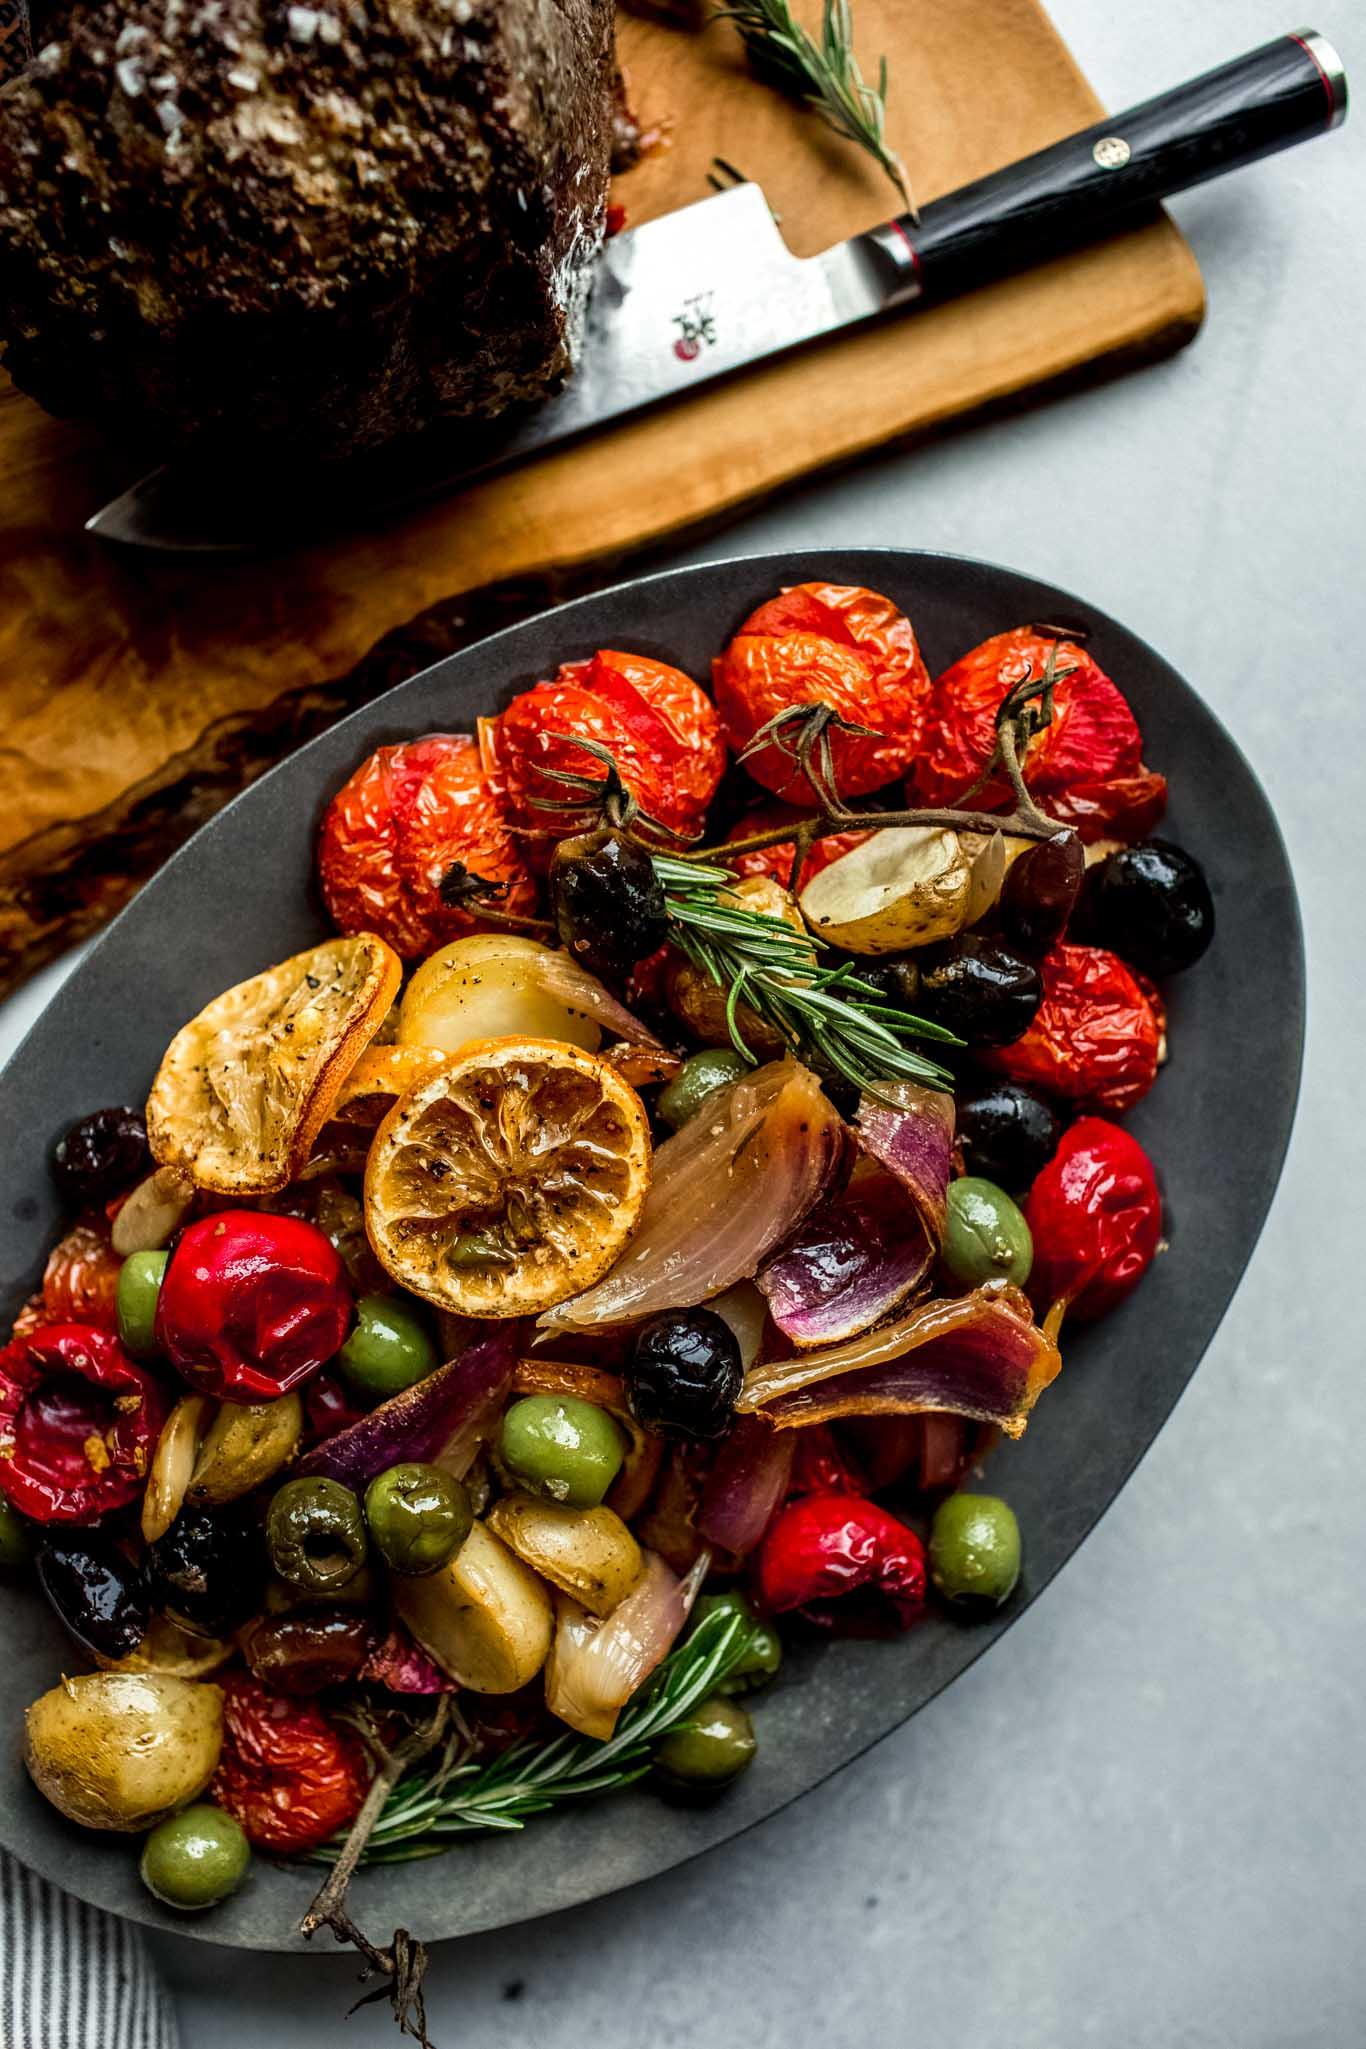 Cooked vegetables and olives on serving platter.